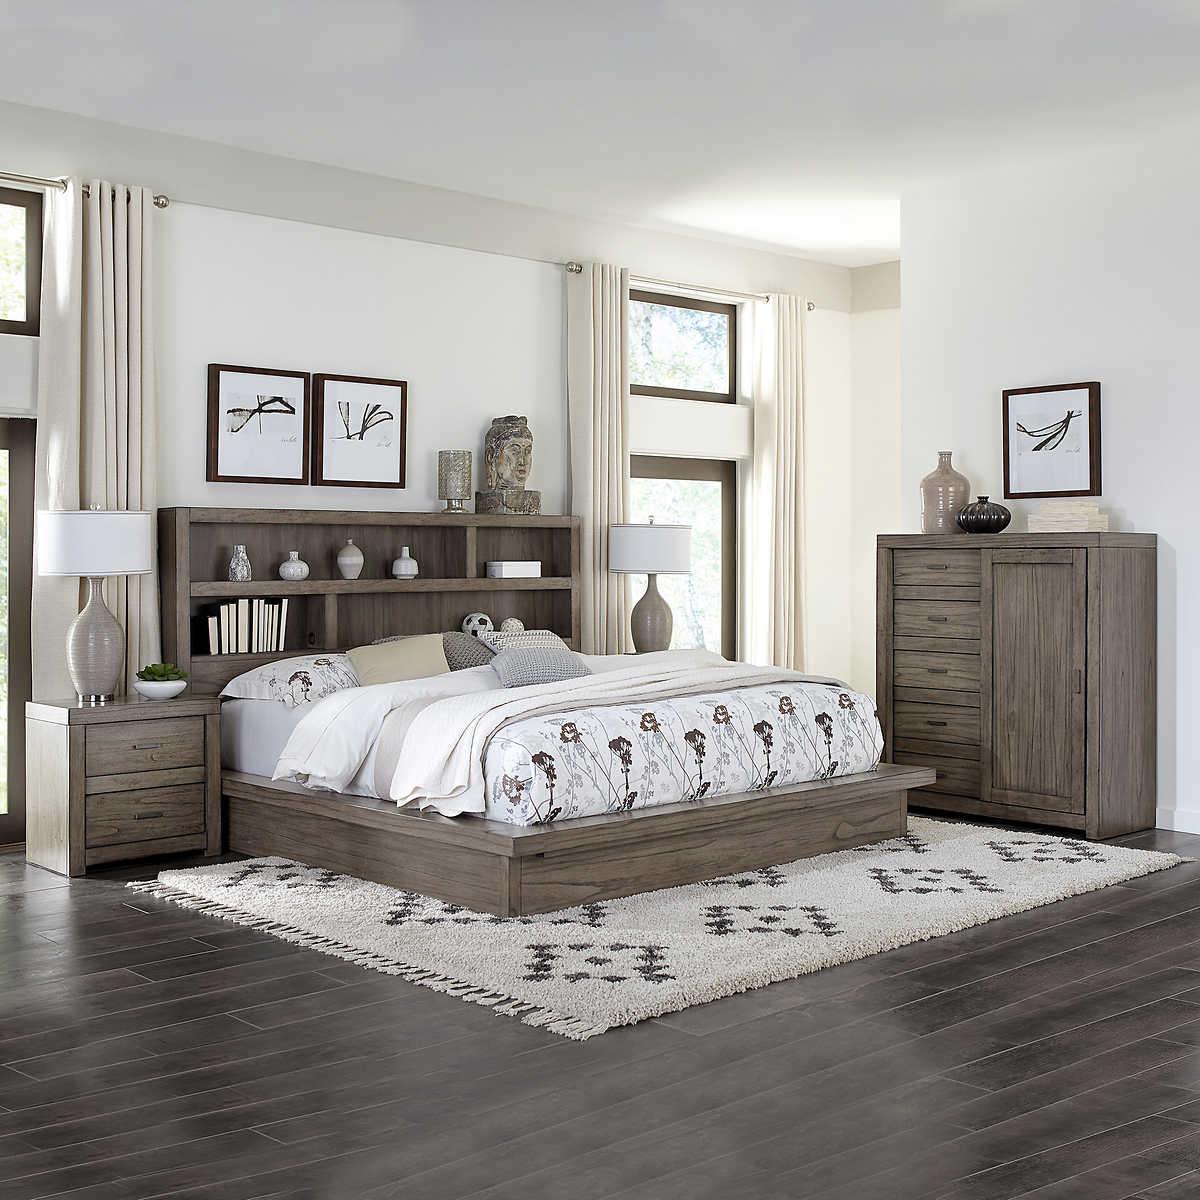 Anoka 4-piece King Bedroom Set